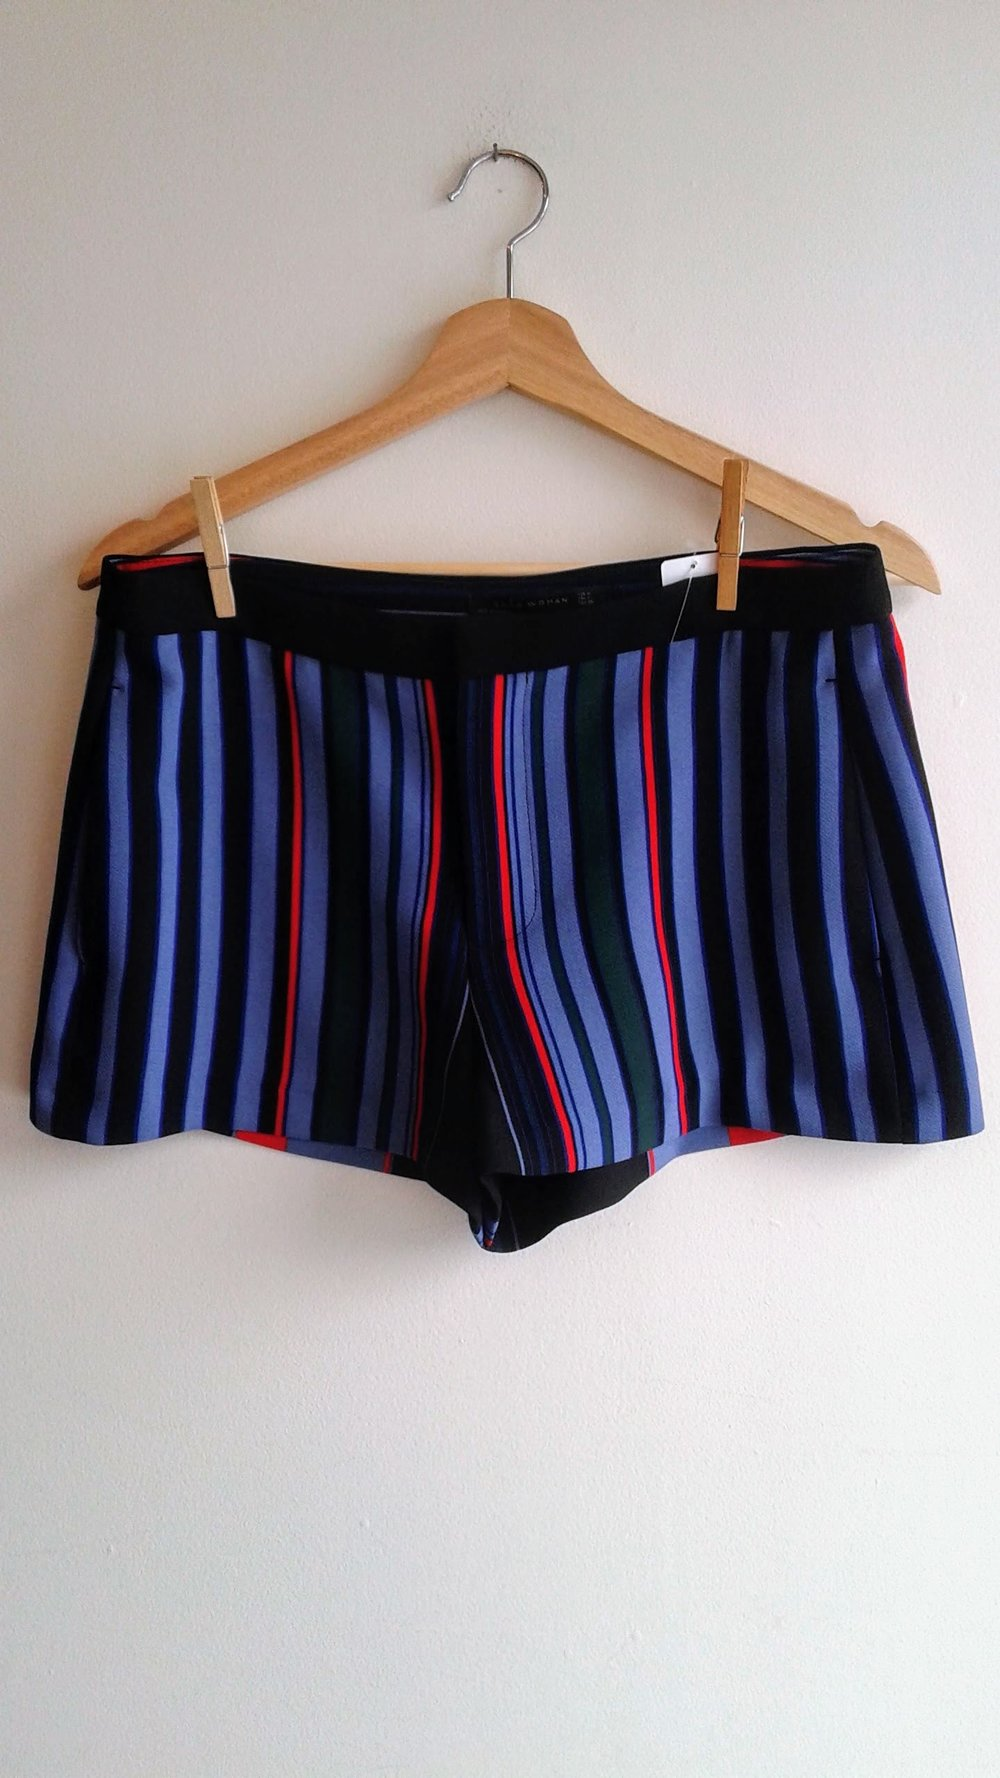 Zara shorts (NWT); Size M, $14